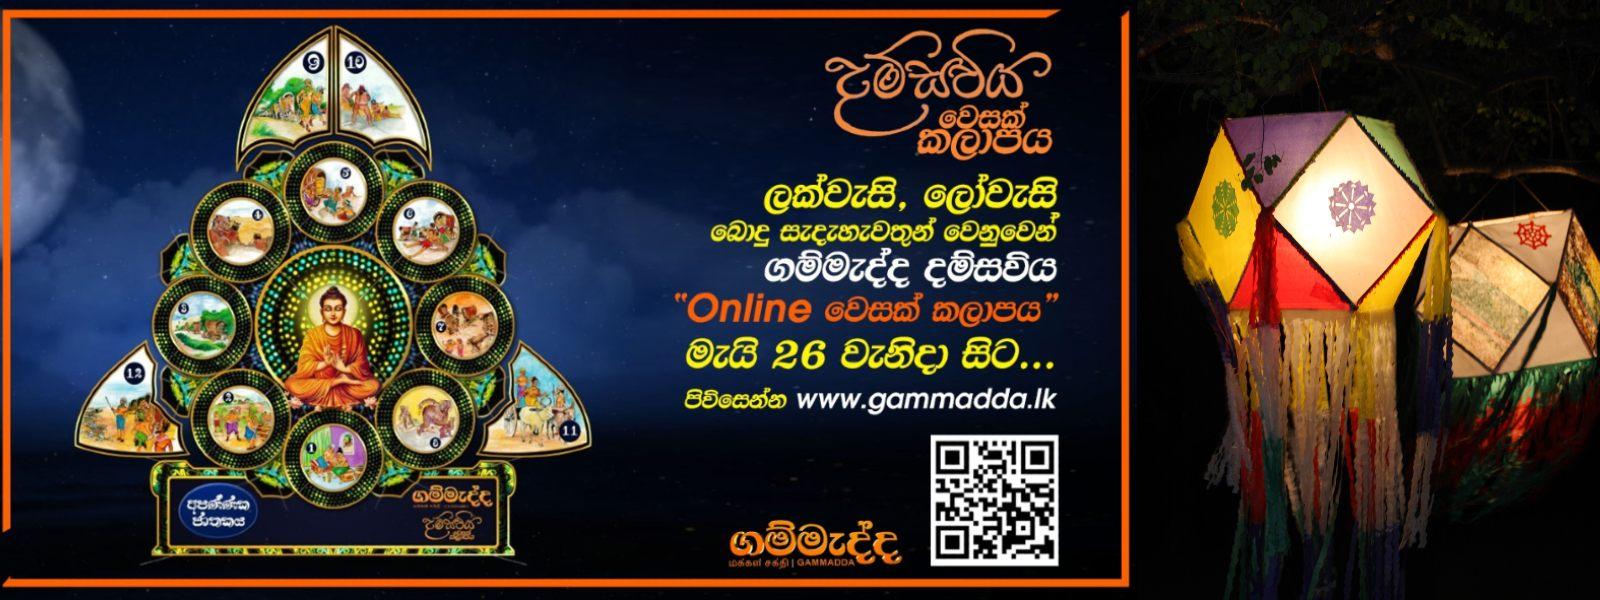 Gammadda launches Online Wesak Zone